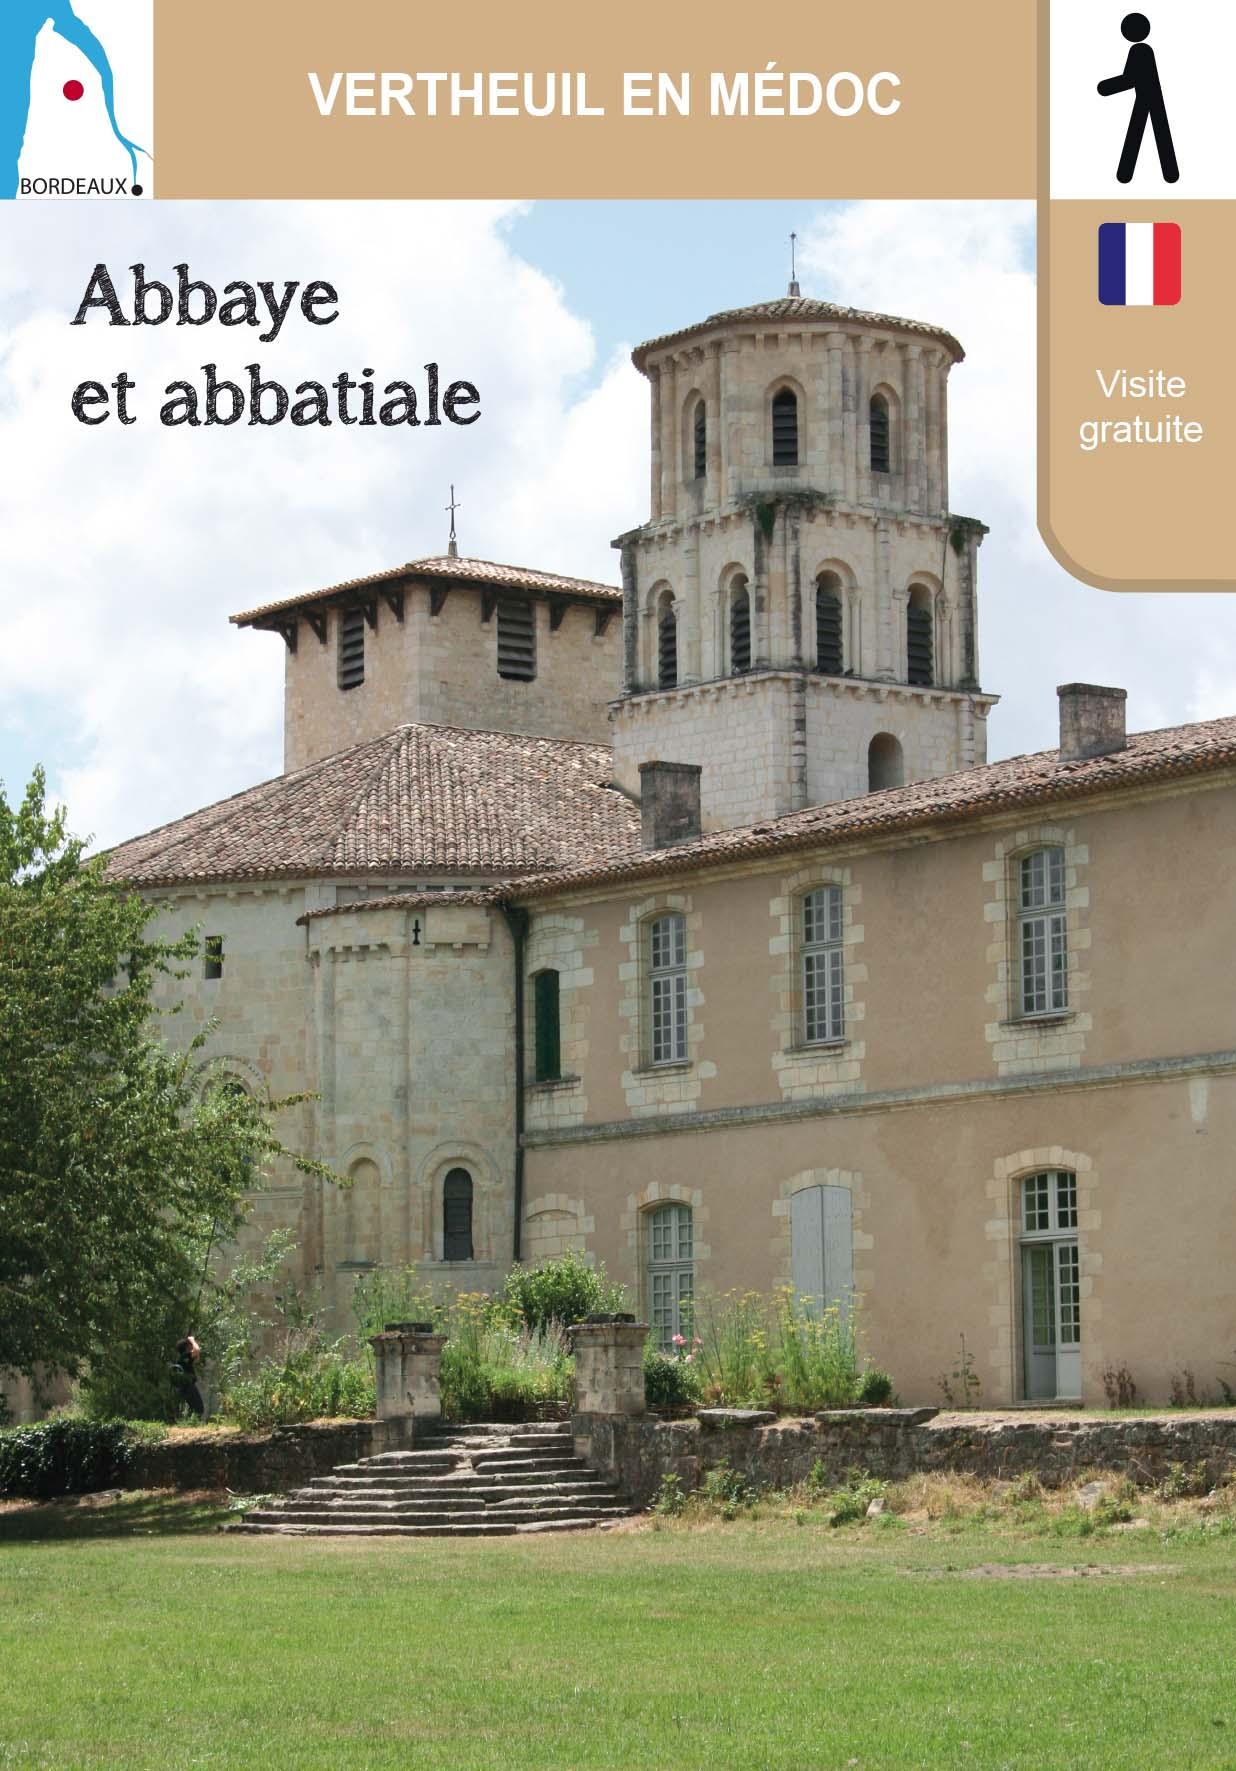 COUV-Vertheuil-ABBAYE-V2016